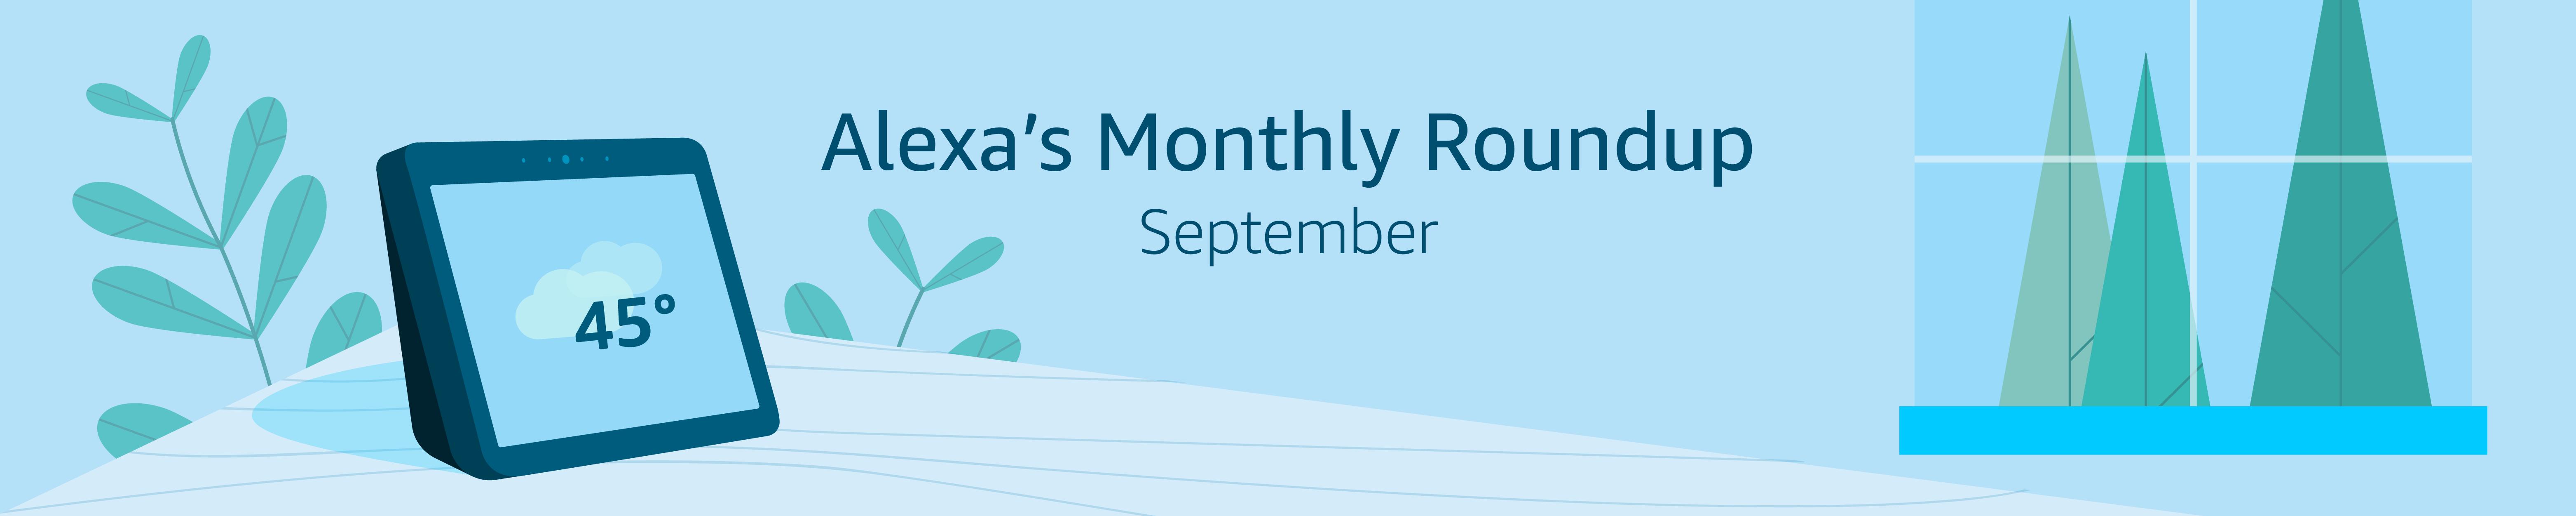 Alexa's Monthly Roundup: September